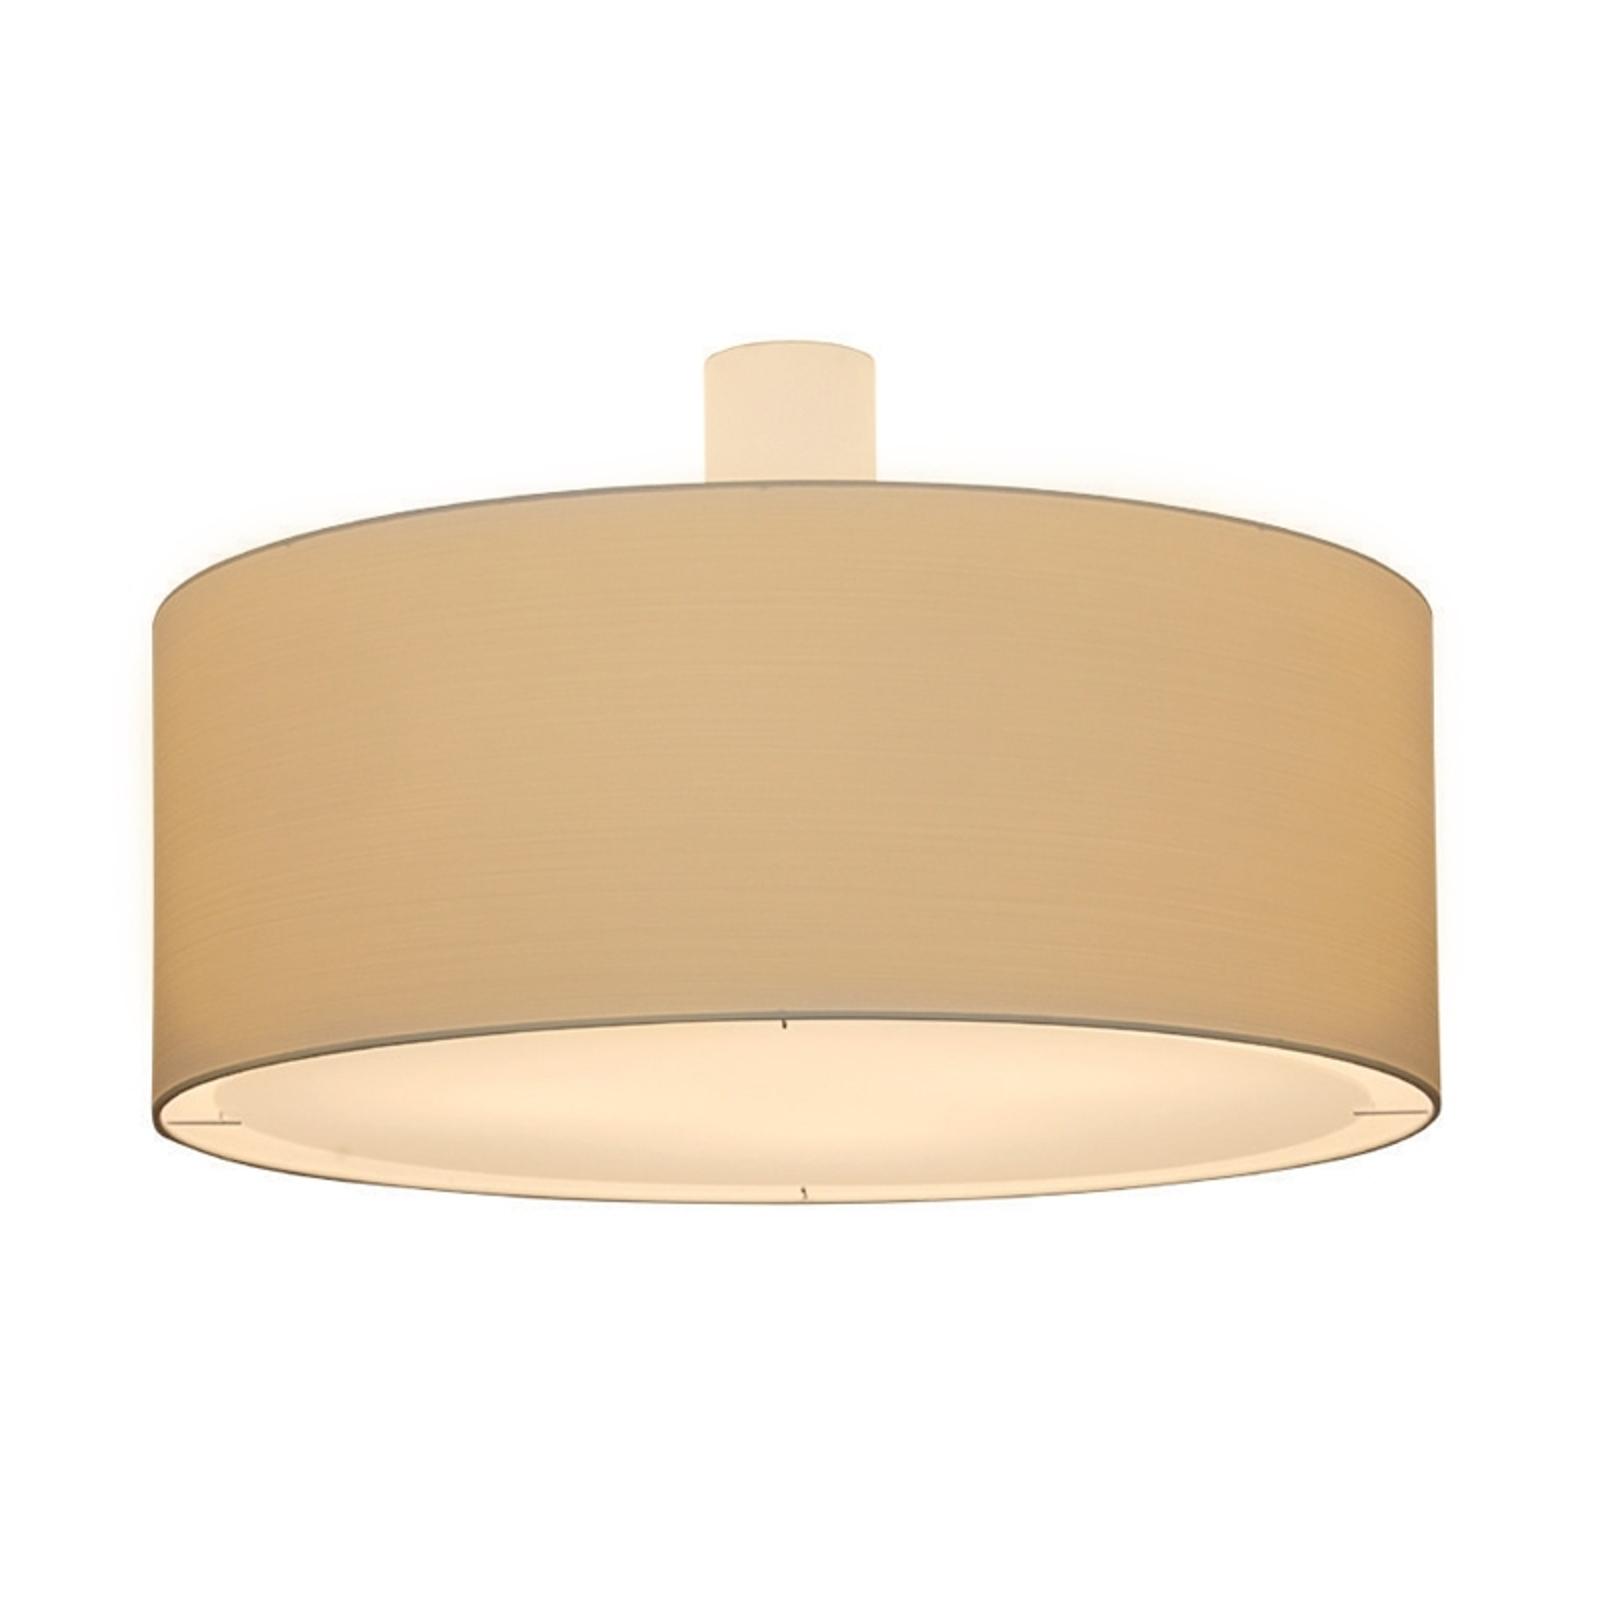 Menzel Living Elegant plafoniera crema 80 cm